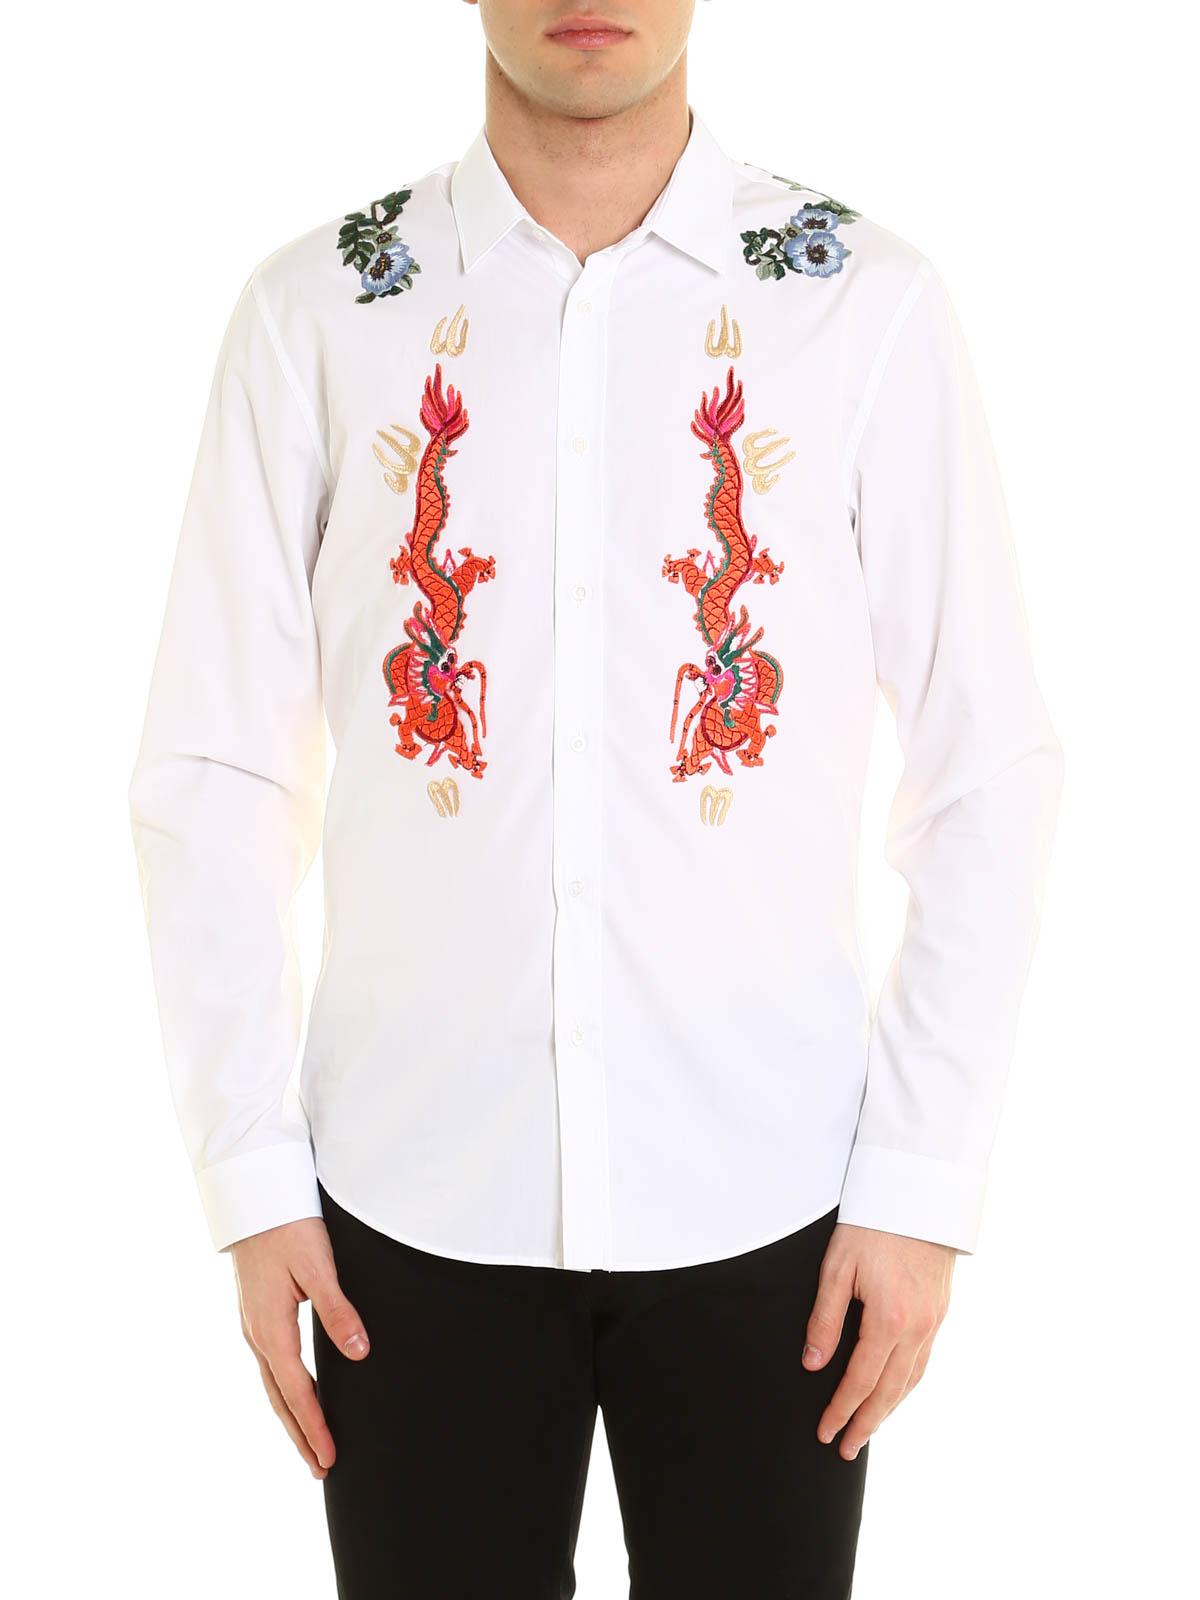 245d7b6b5 Gucci - Camisa Blanca Para Hombre - Camisas - 463424Z349C9004 ...